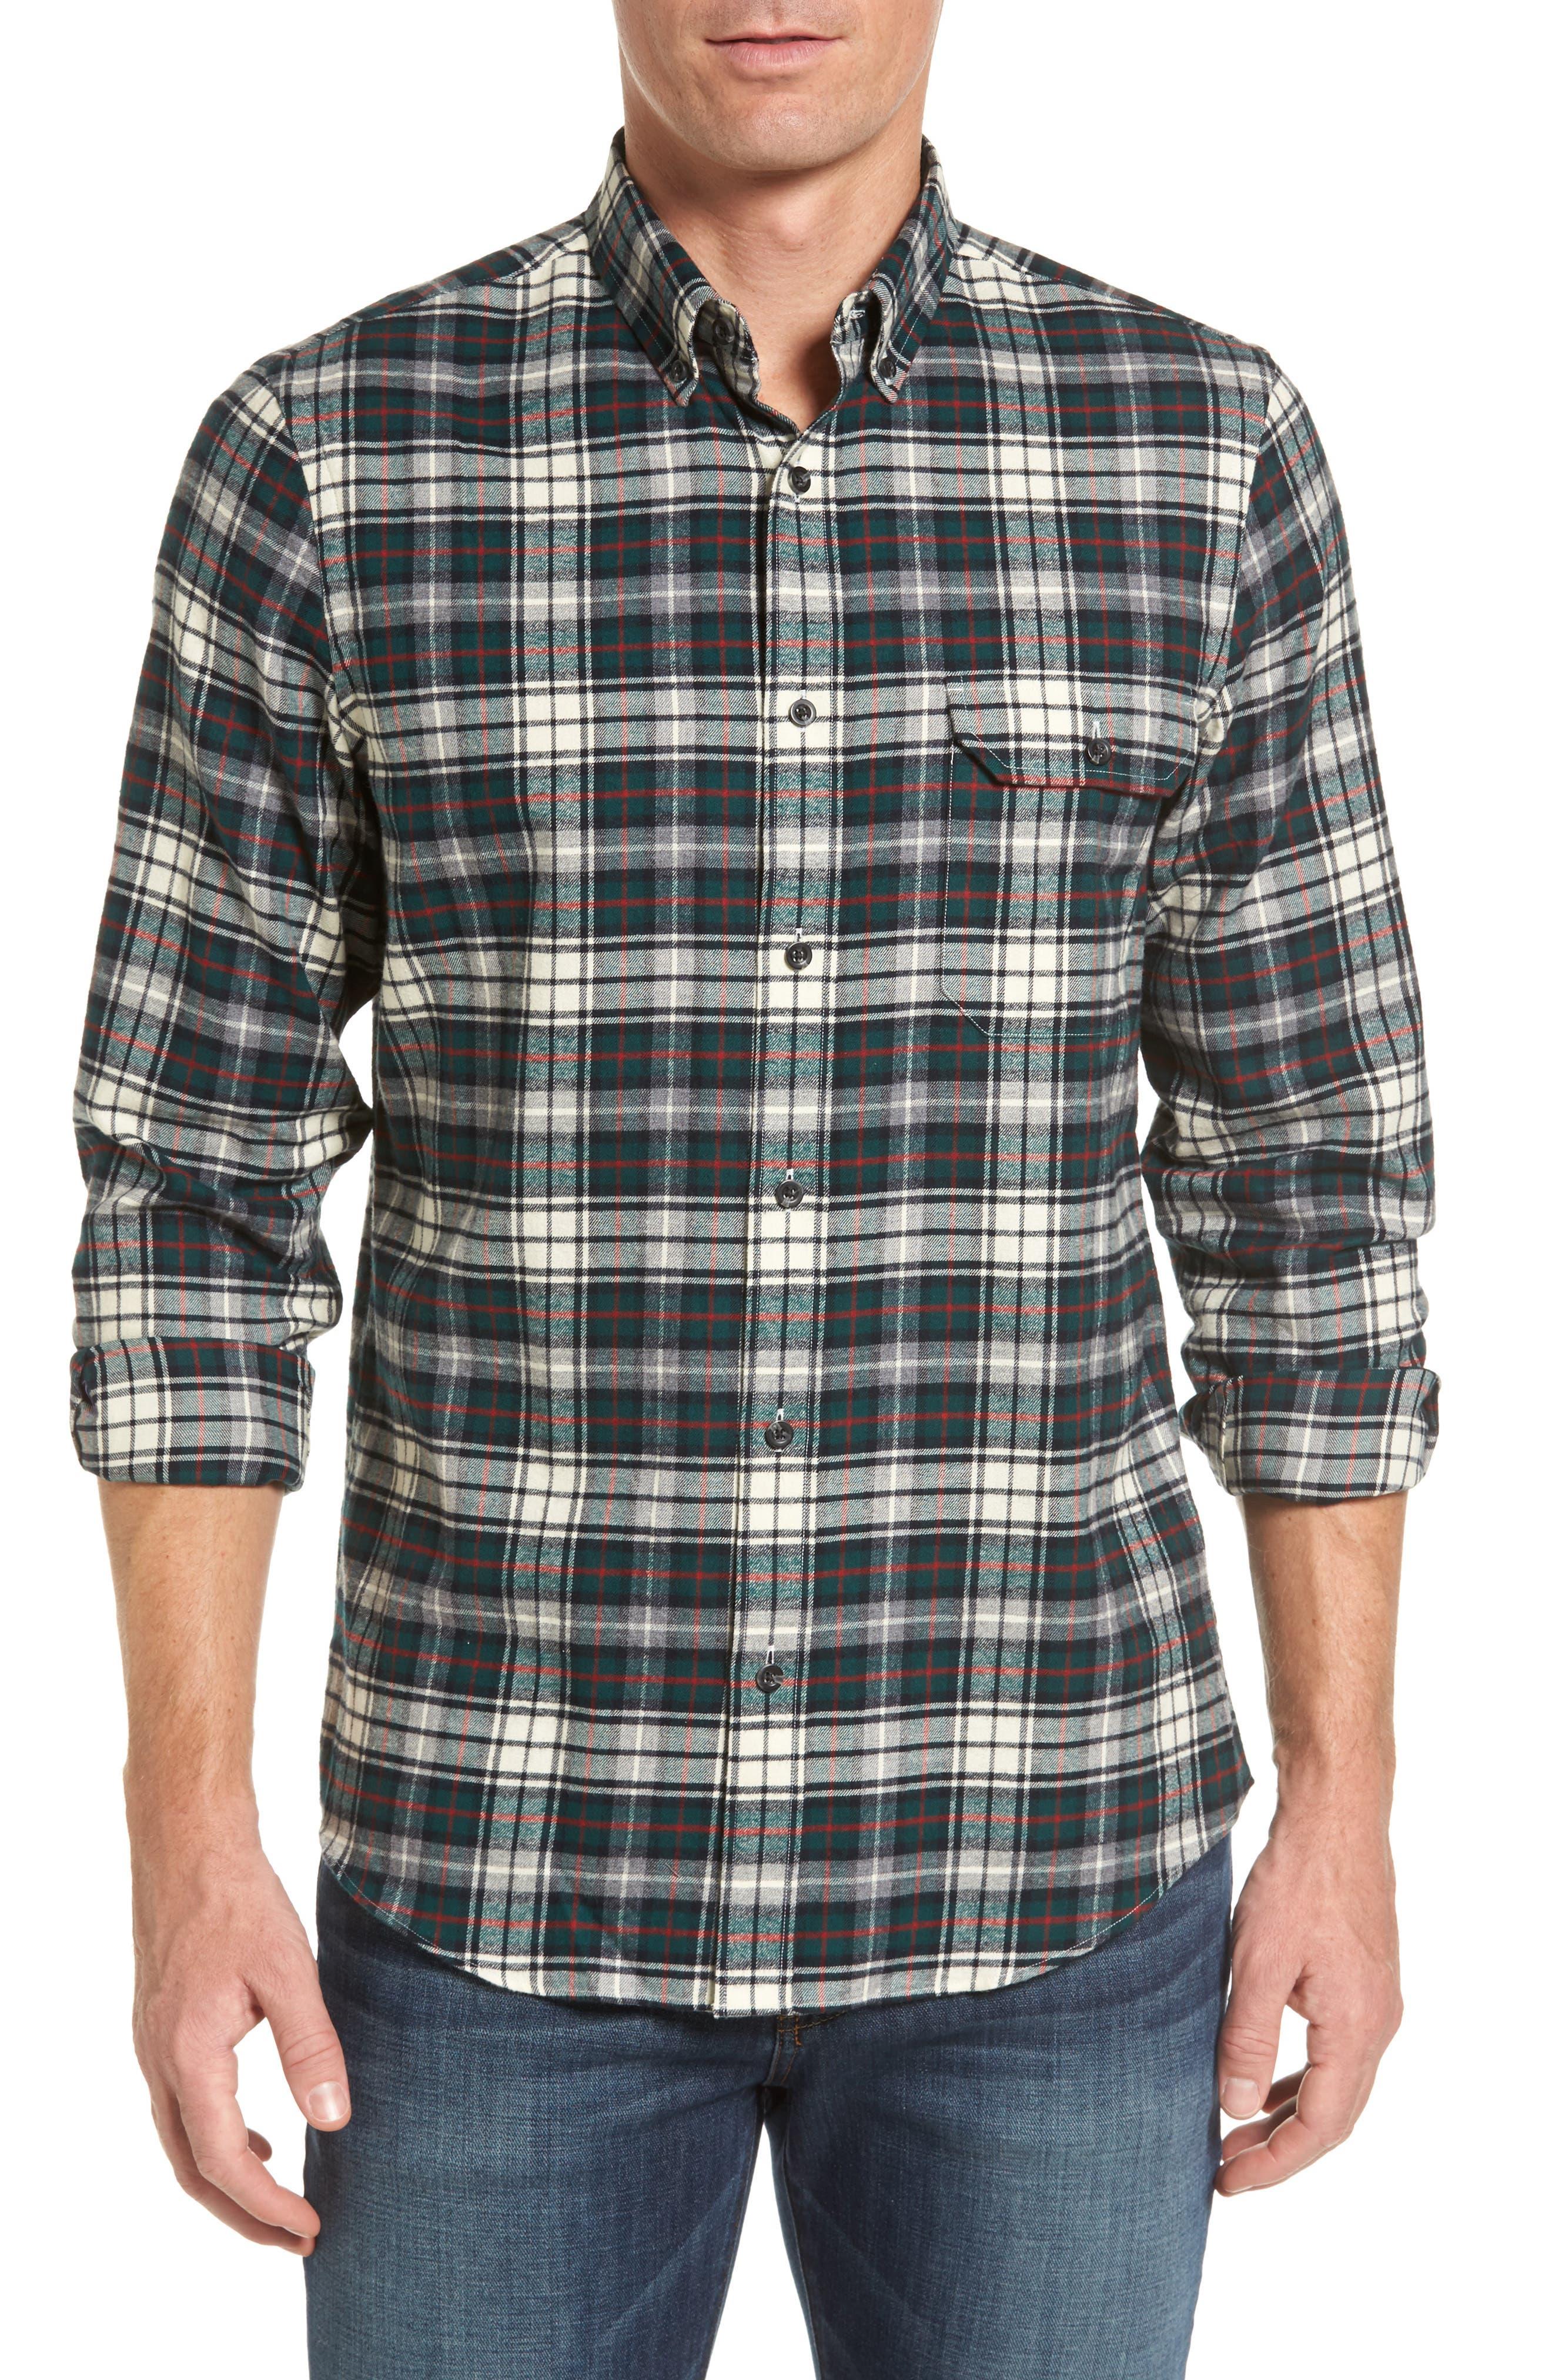 Nordstrom Men's Shop Regular Fit Plaid Sport Shirt